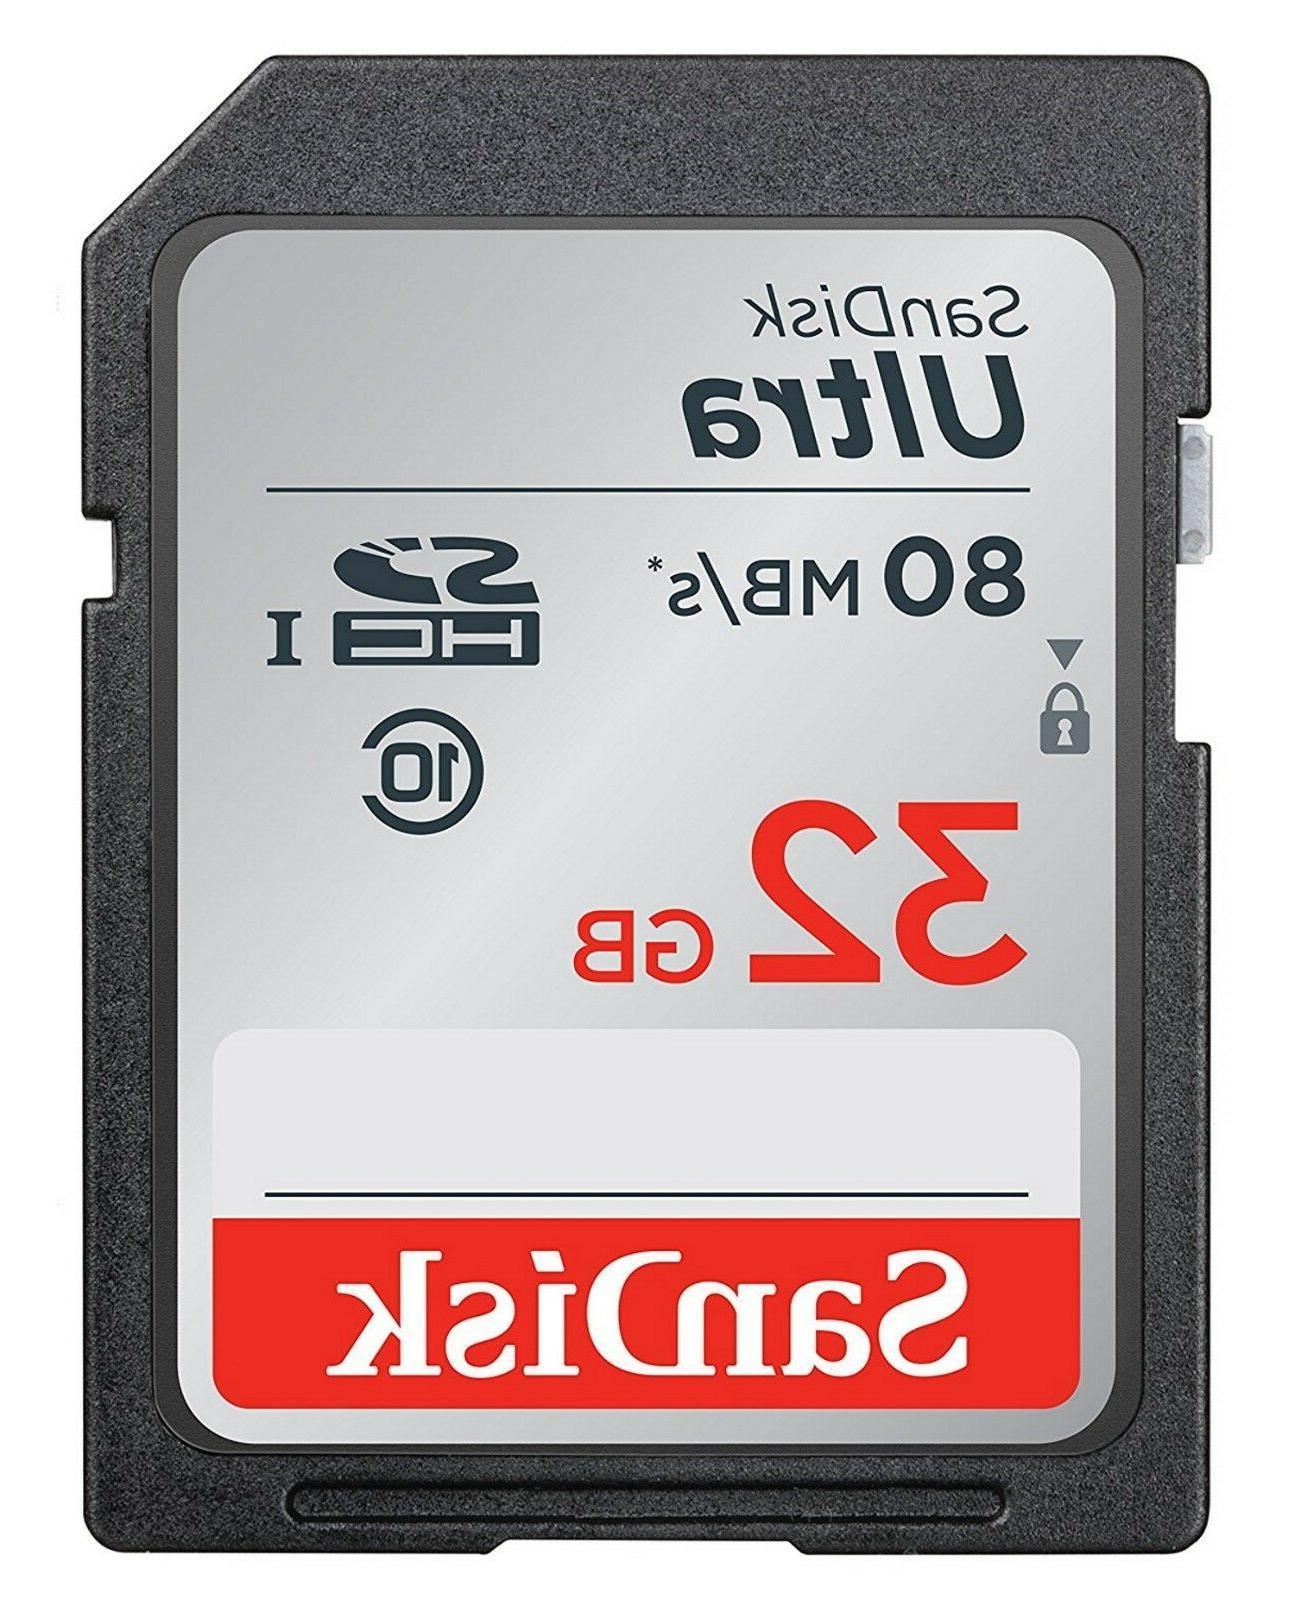 SD Class 10 Ultra UHS-I For Nikon DSLR Camera